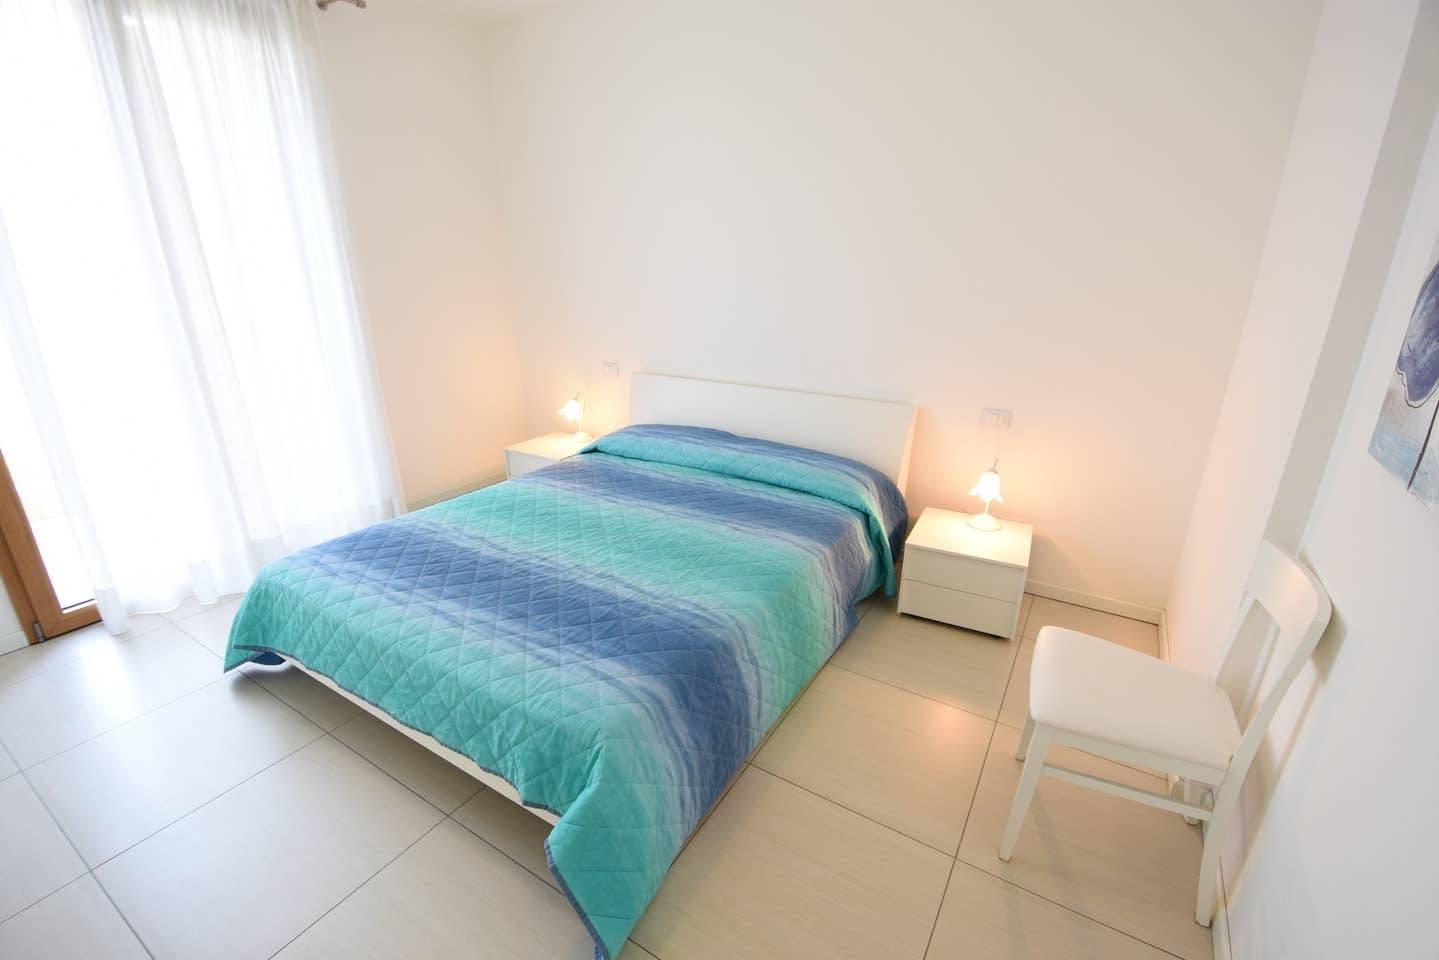 camera-matrimoniale-residence-ulivi-1082081236